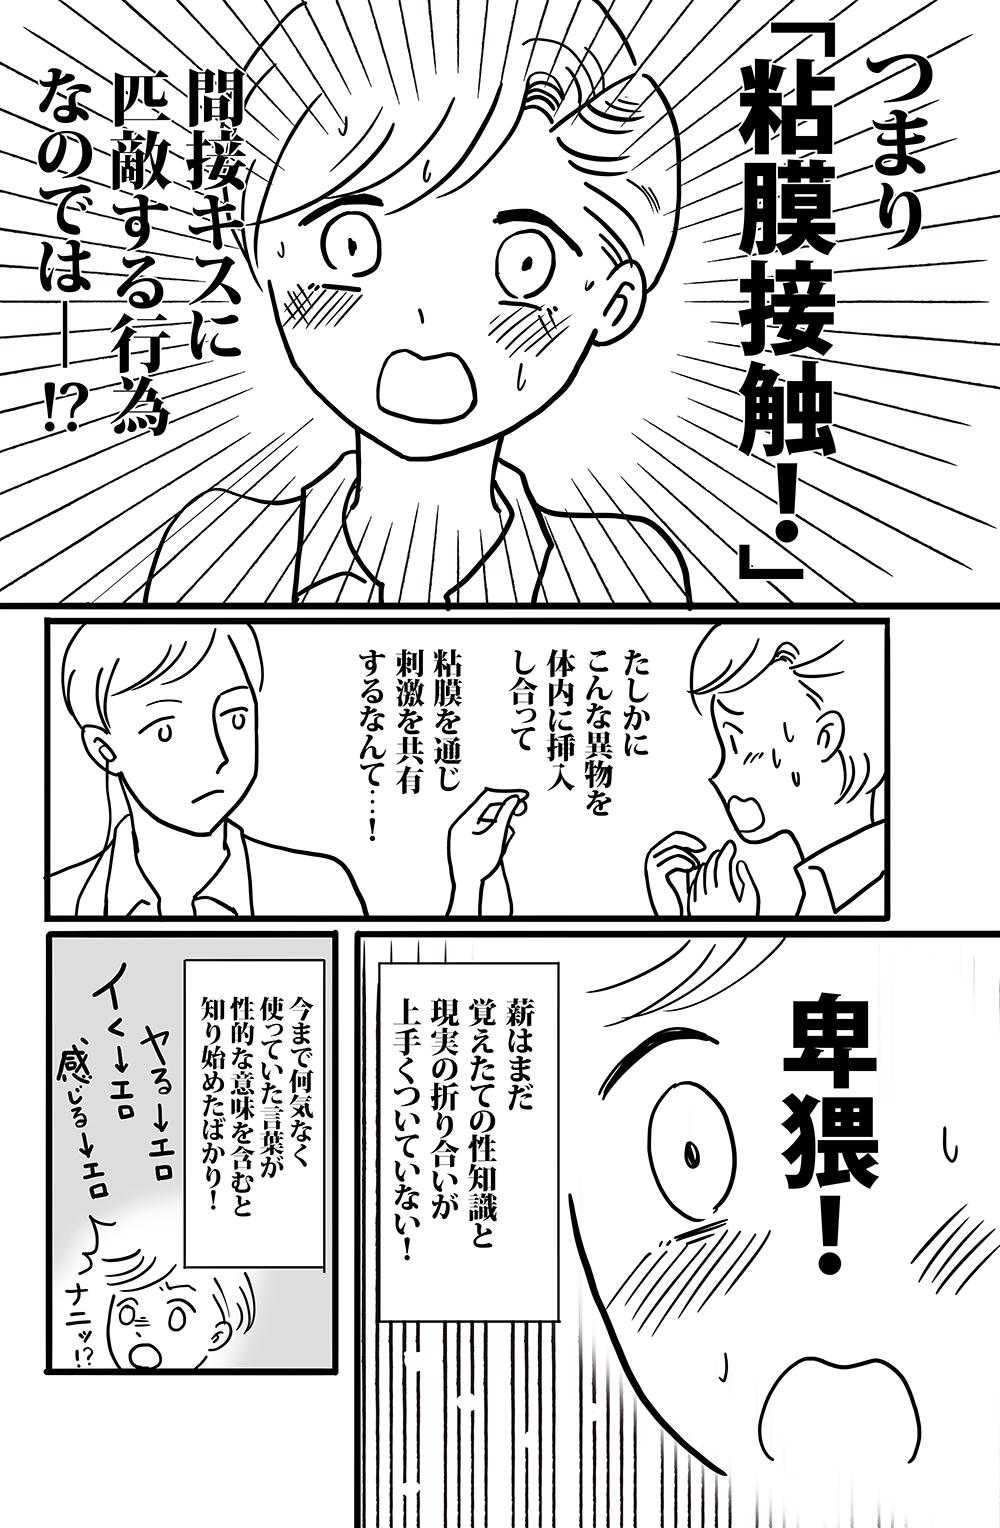 tsuyosisama02.jpg